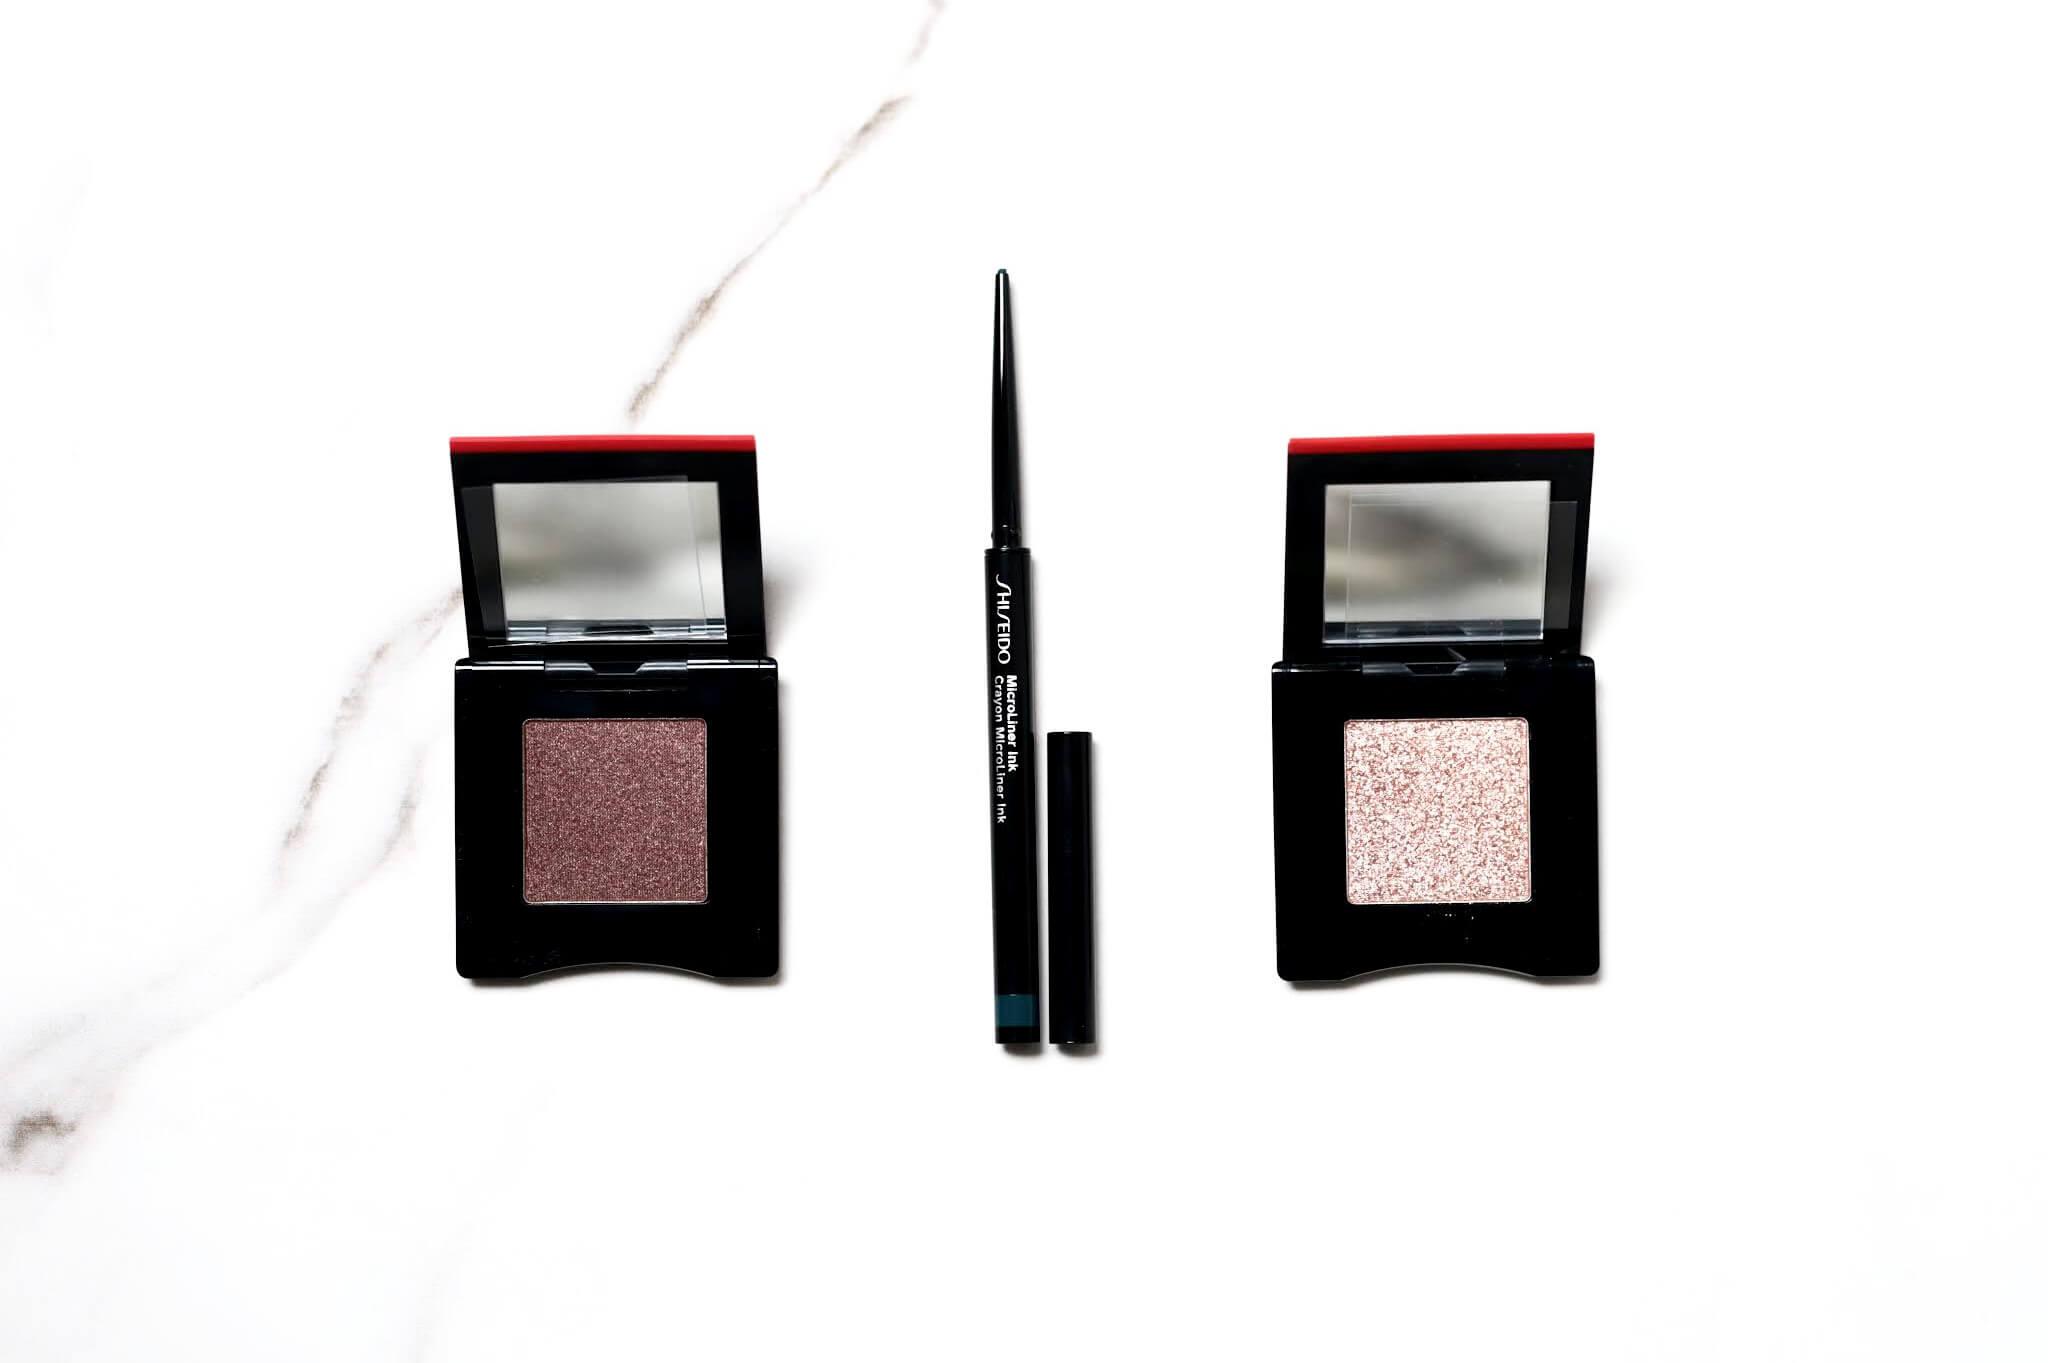 Shiseido Pop Powdergel fard paupières microliner ink